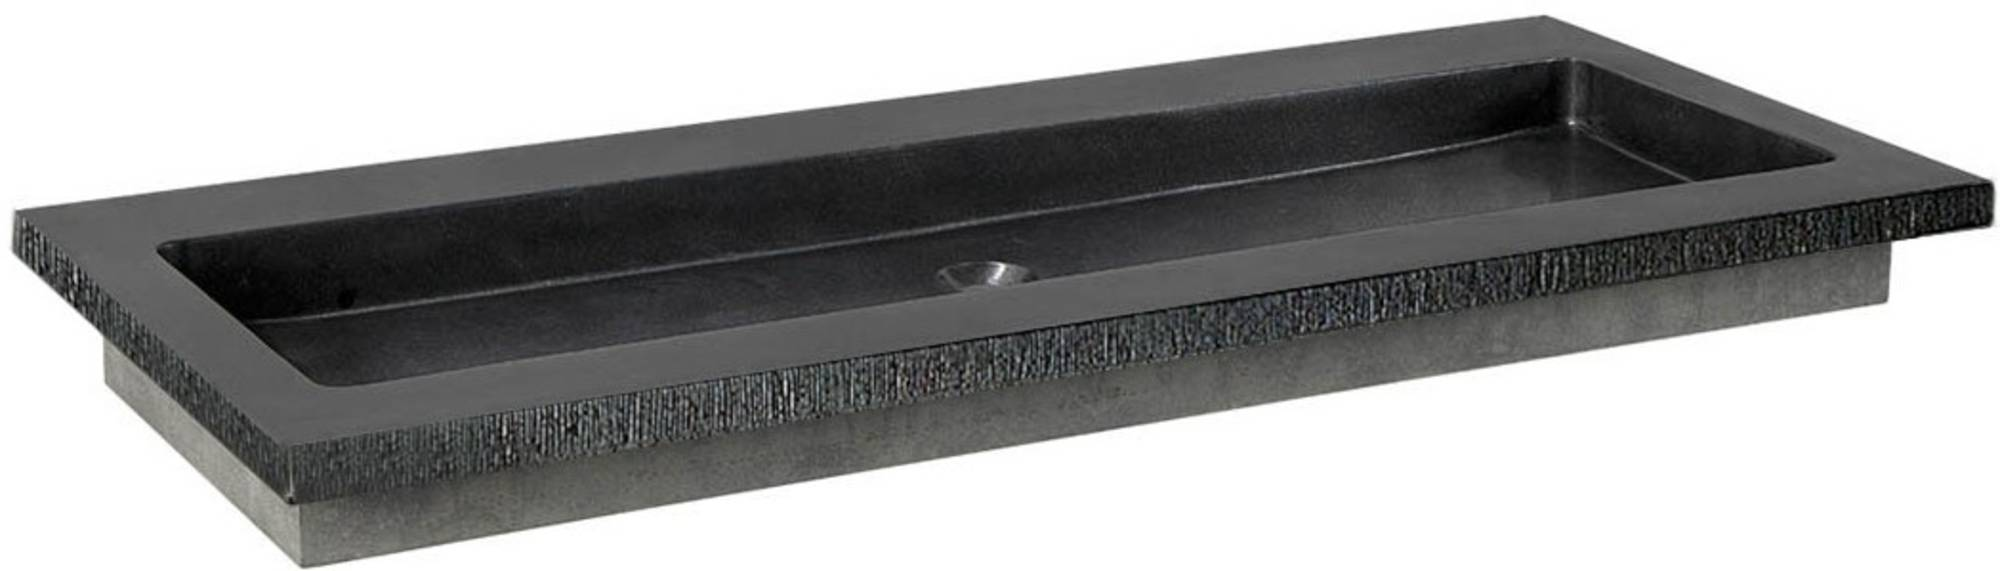 Ben Naturno Wastafel Graniet Gezoet Gefrijnd 100,5x51,5x3 cm zonder Krg. Zwart